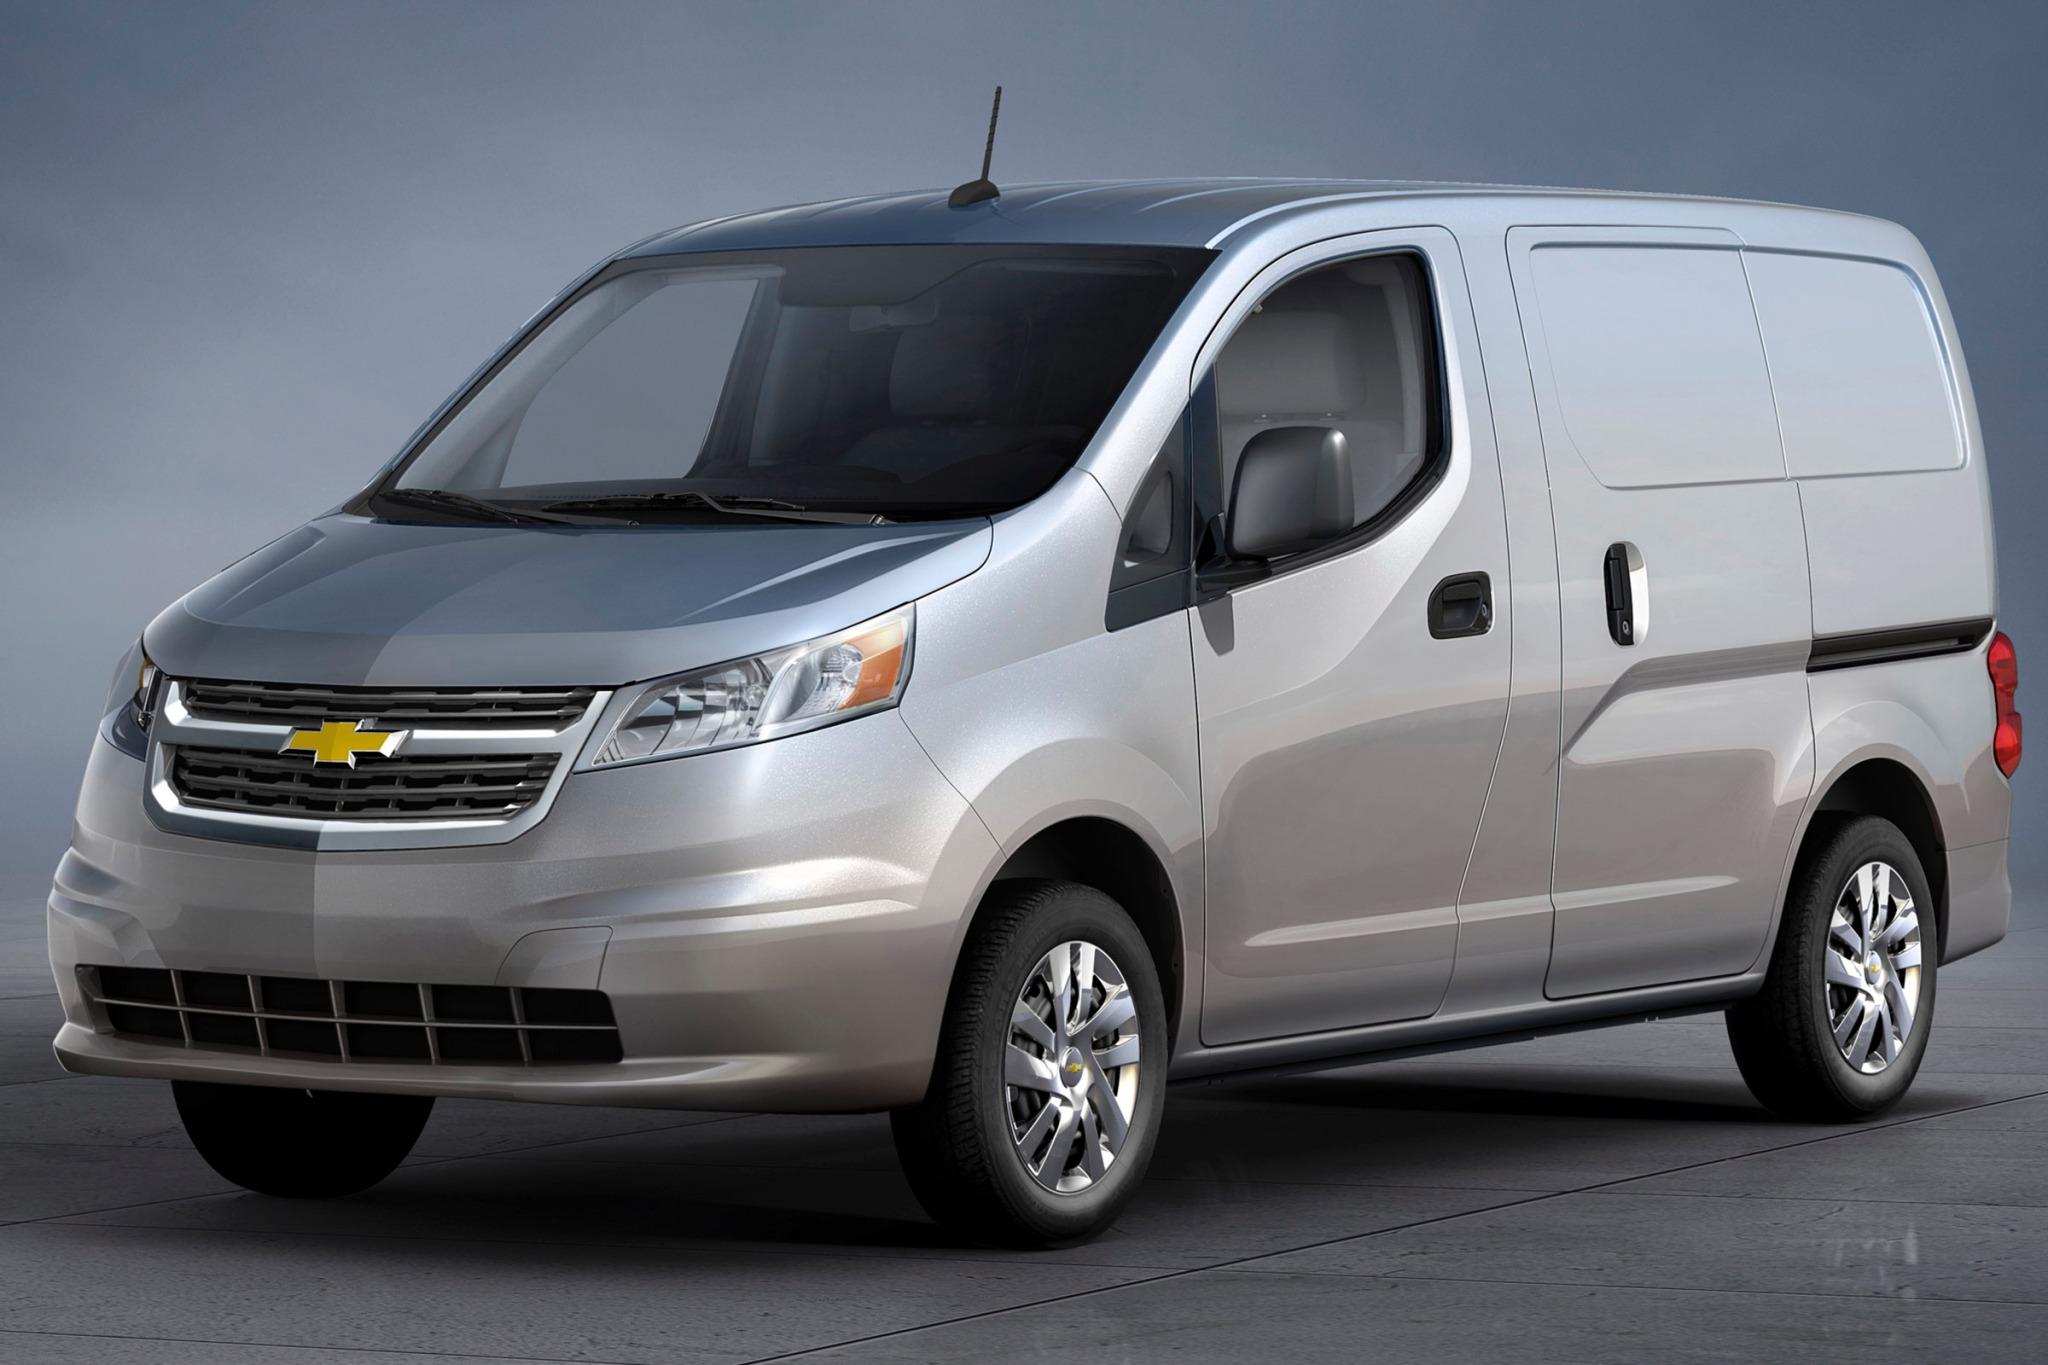 2015 chevrolet city express cargo minivan lt fq oem 1 2048